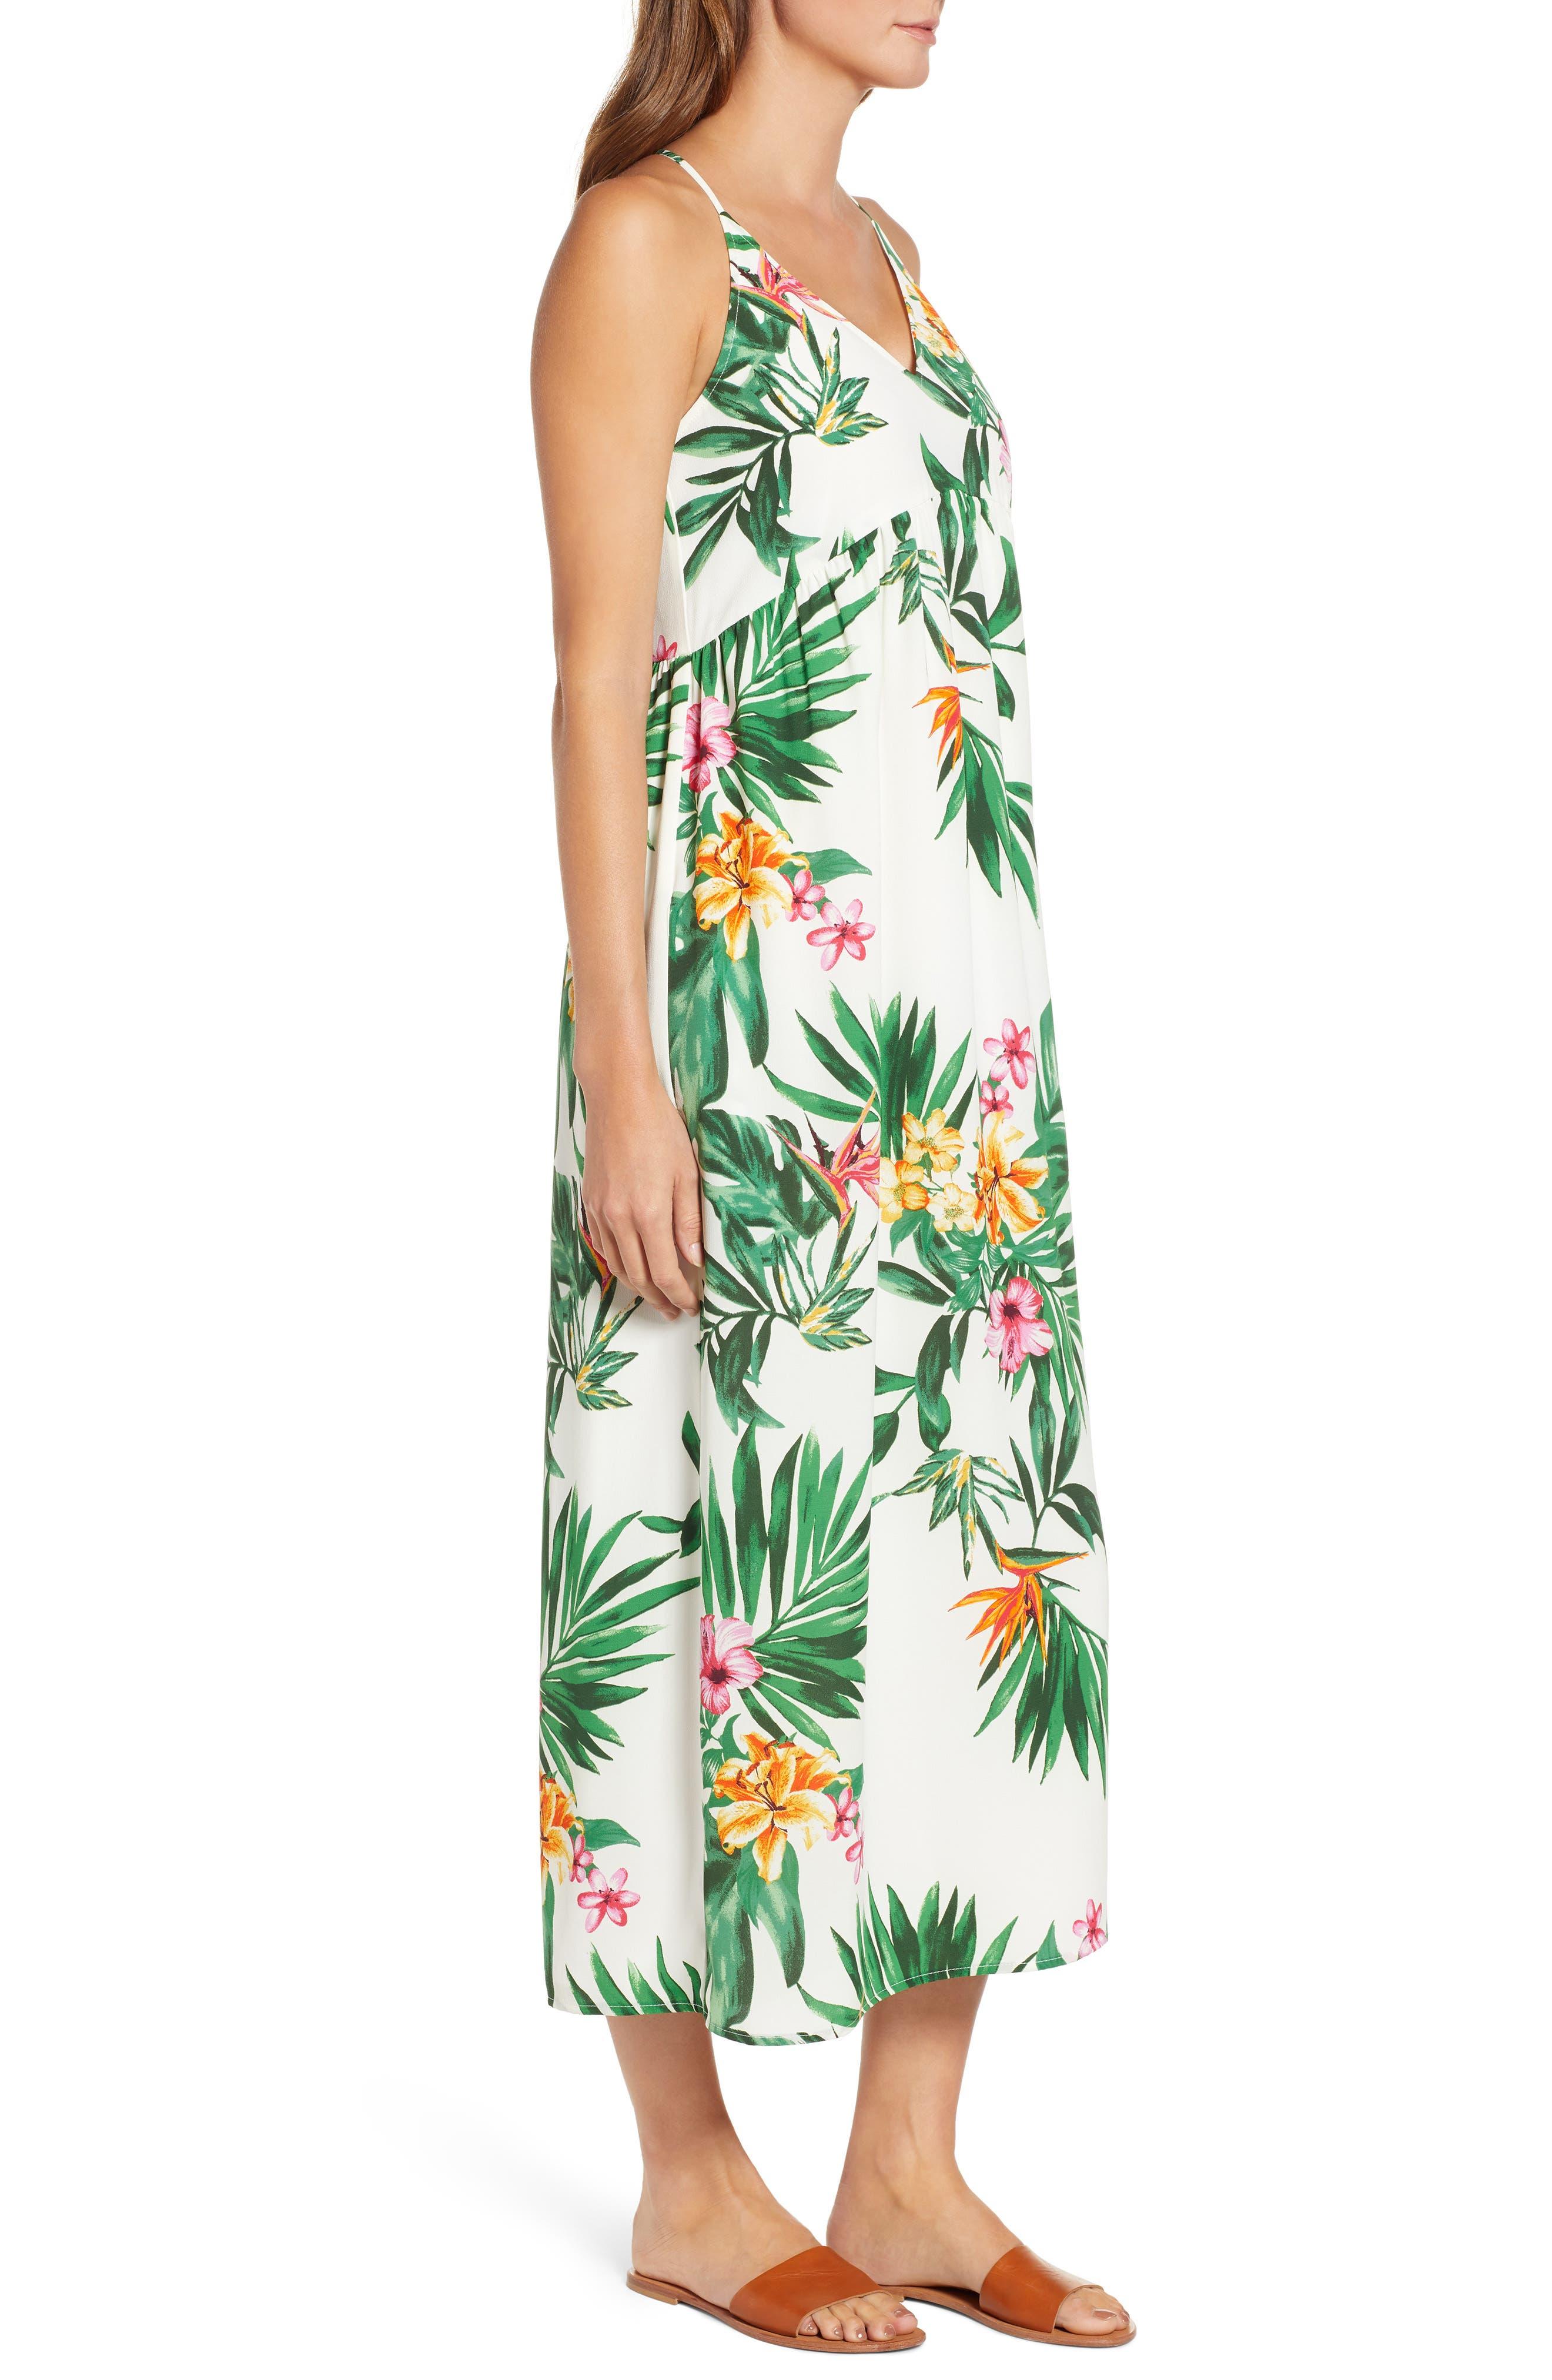 GIBSON, x Hi Sugarplum! Palm Springs Festival Maxi Dress, Alternate thumbnail 3, color, BIRD OF PARADISE